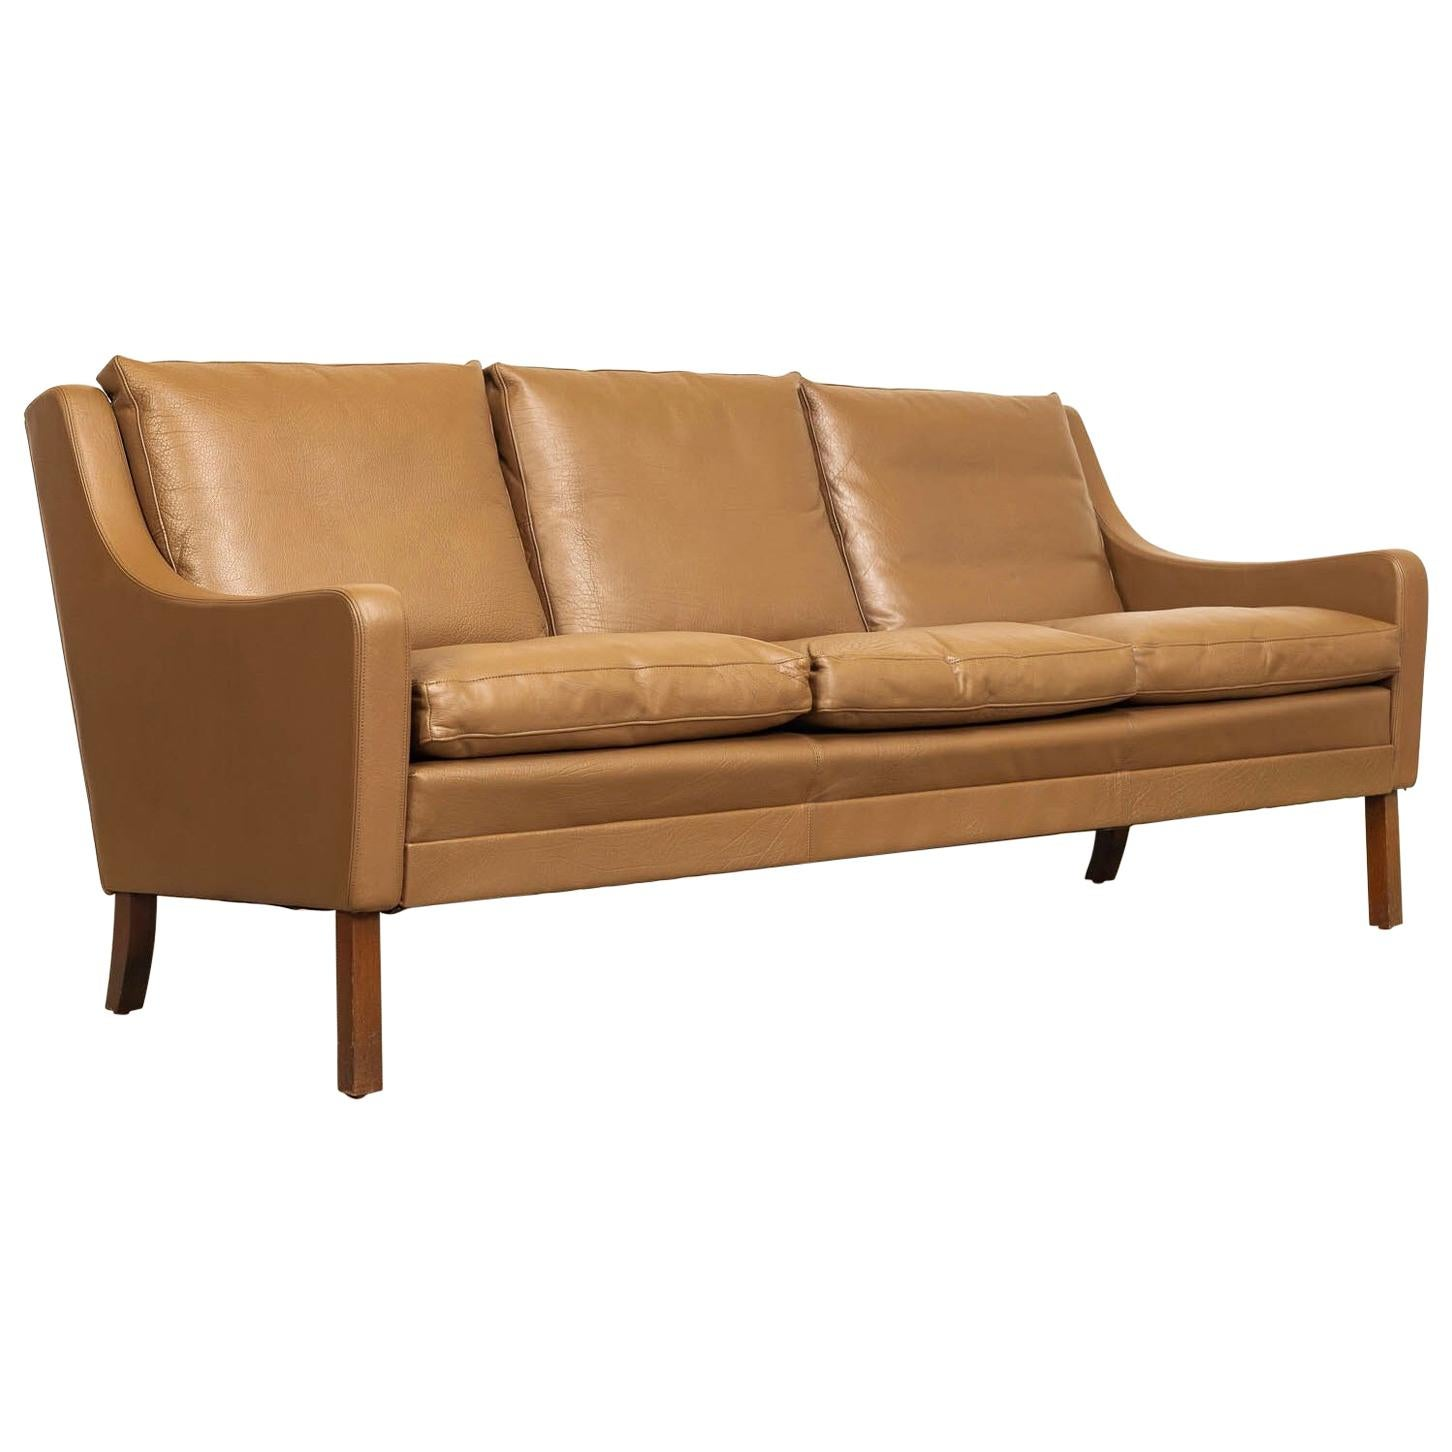 Vintage Midcentury Danish Modern Brown Leather Three Seat Sofa 1960s